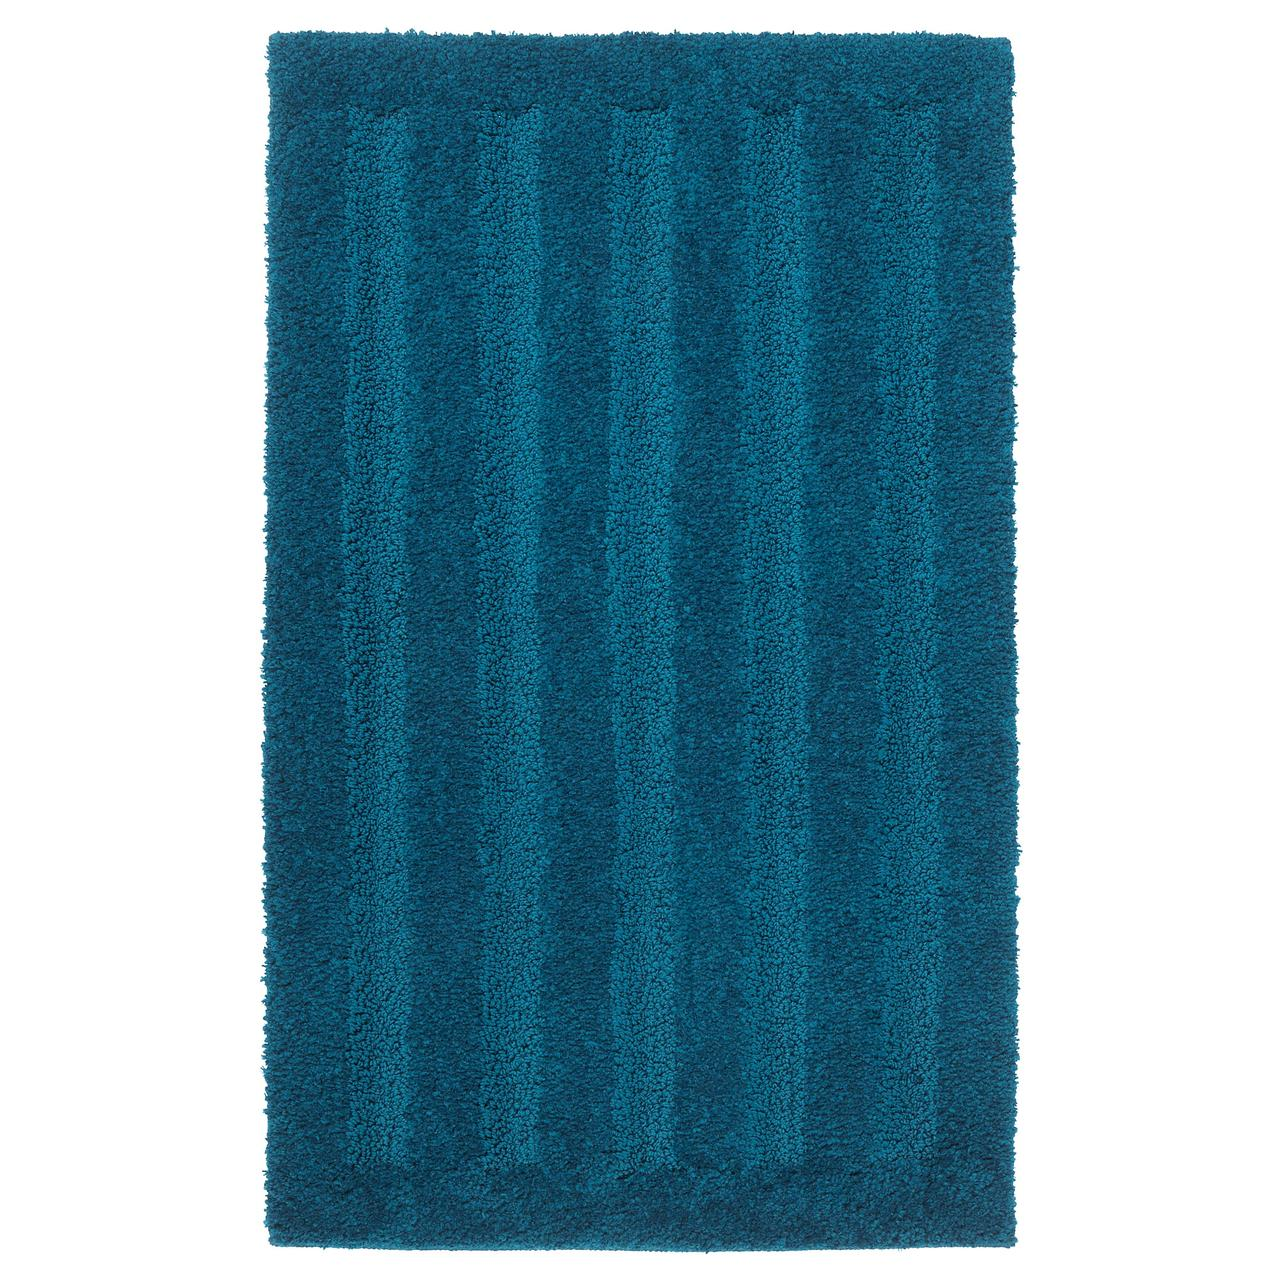 ЭМТЕН Коврик для ванной, темно-синий